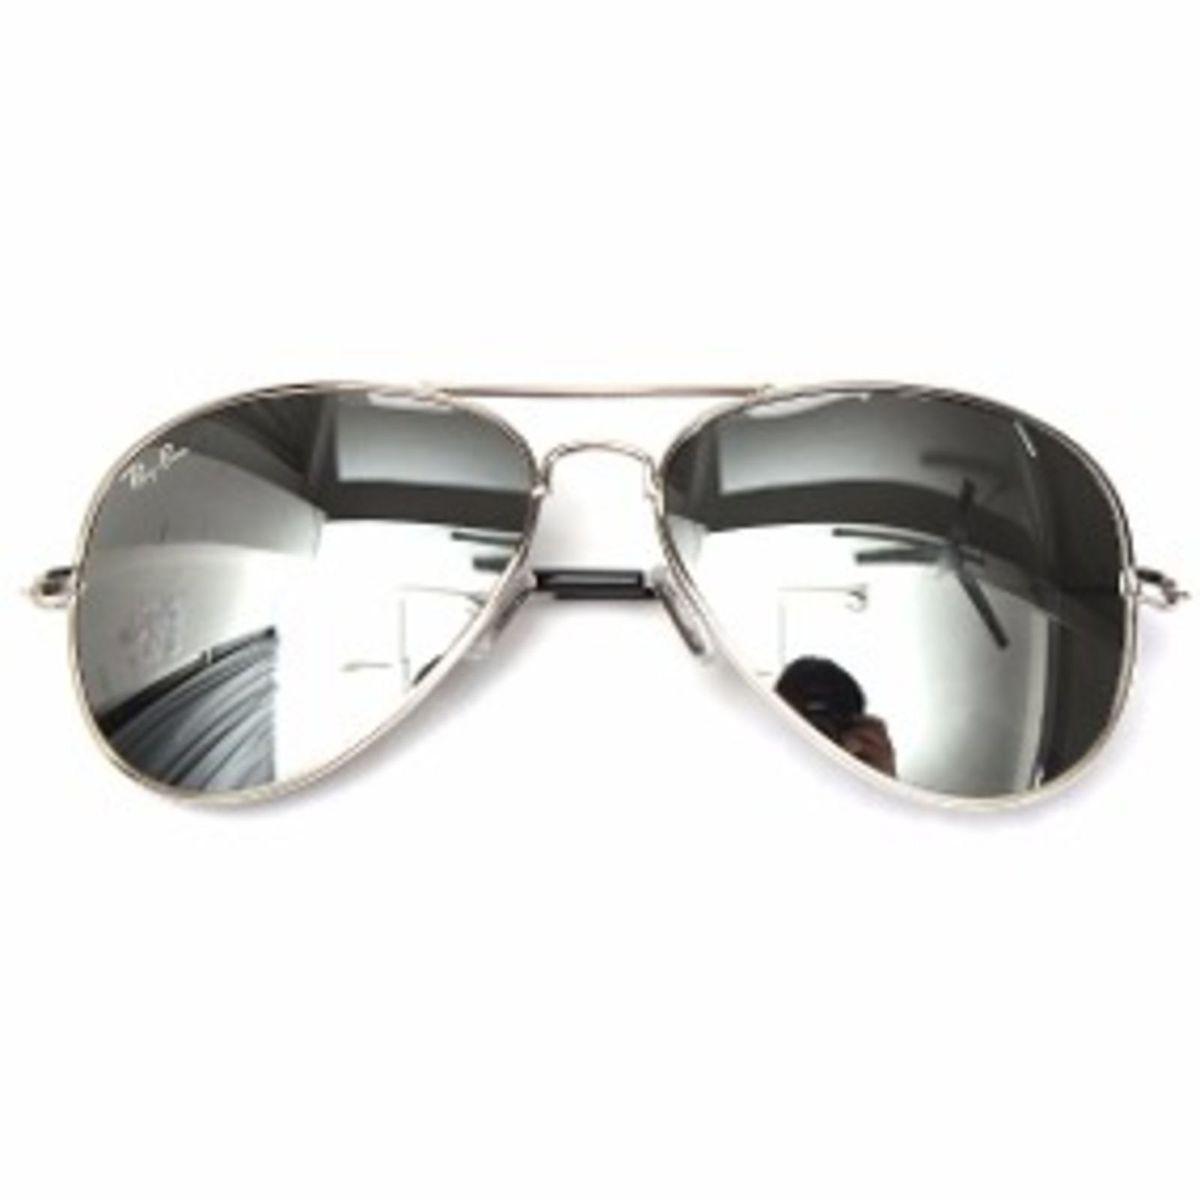 c85a44bcf Óculos de Sol Ray Ban Prata Espelhado Feminino Masculino | Óculos Feminino Ray  Ban Nunca Usado 25035530 | enjoei